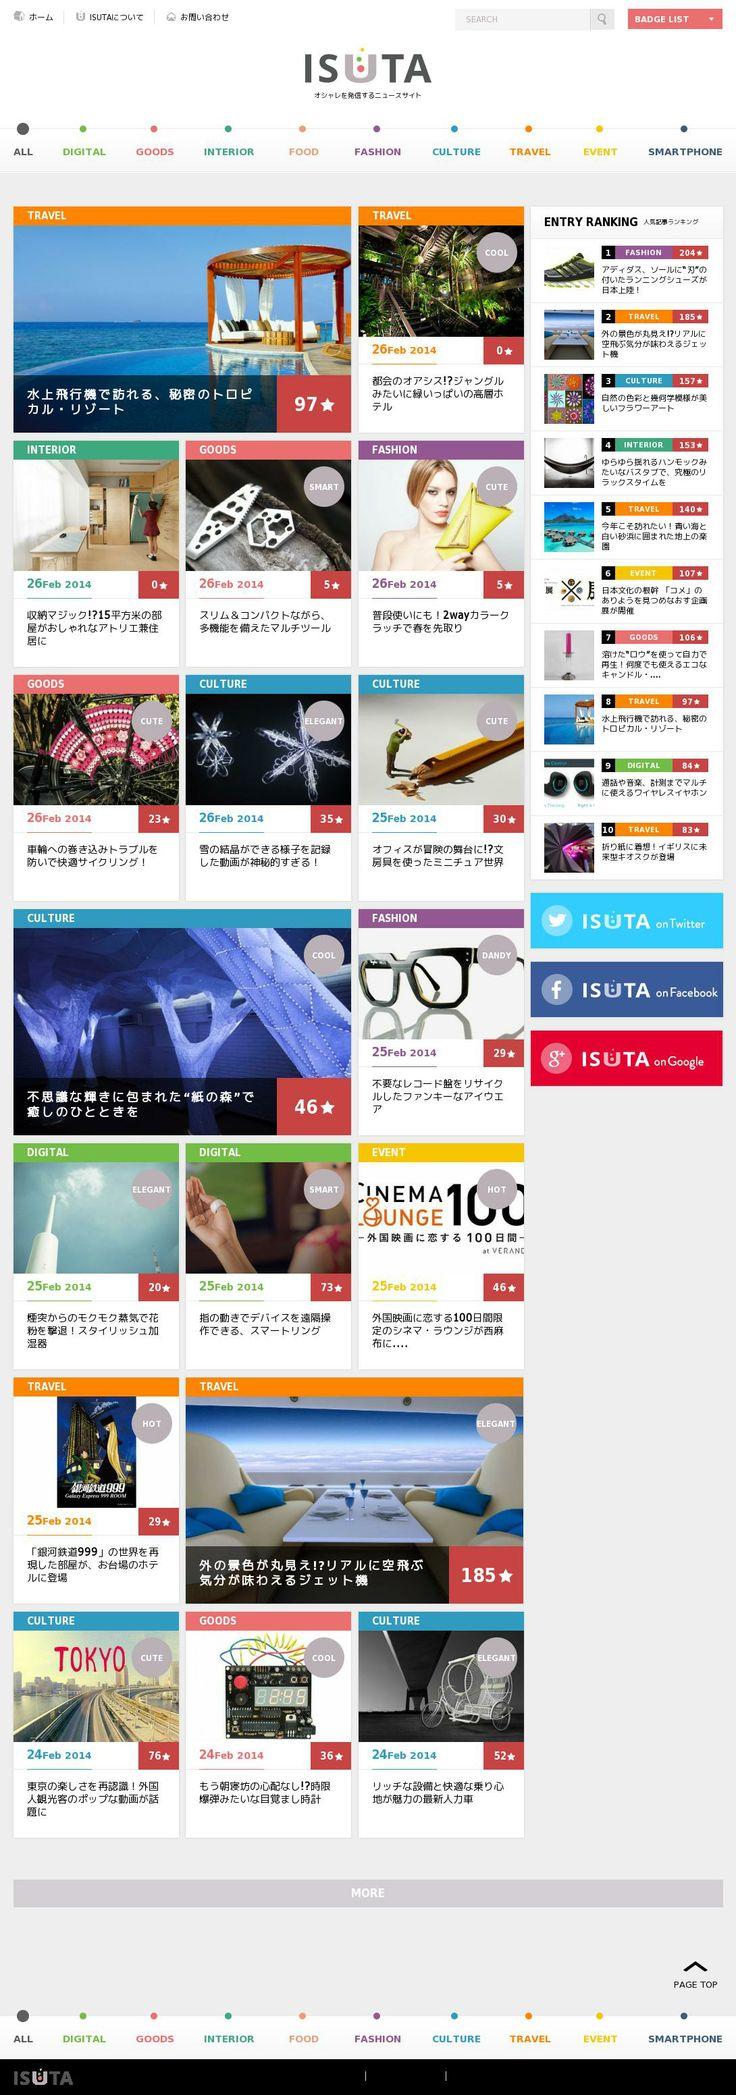 The website 'http://isuta.jp/' courtesy of @Pinstamatic (http://pinstamatic.com)